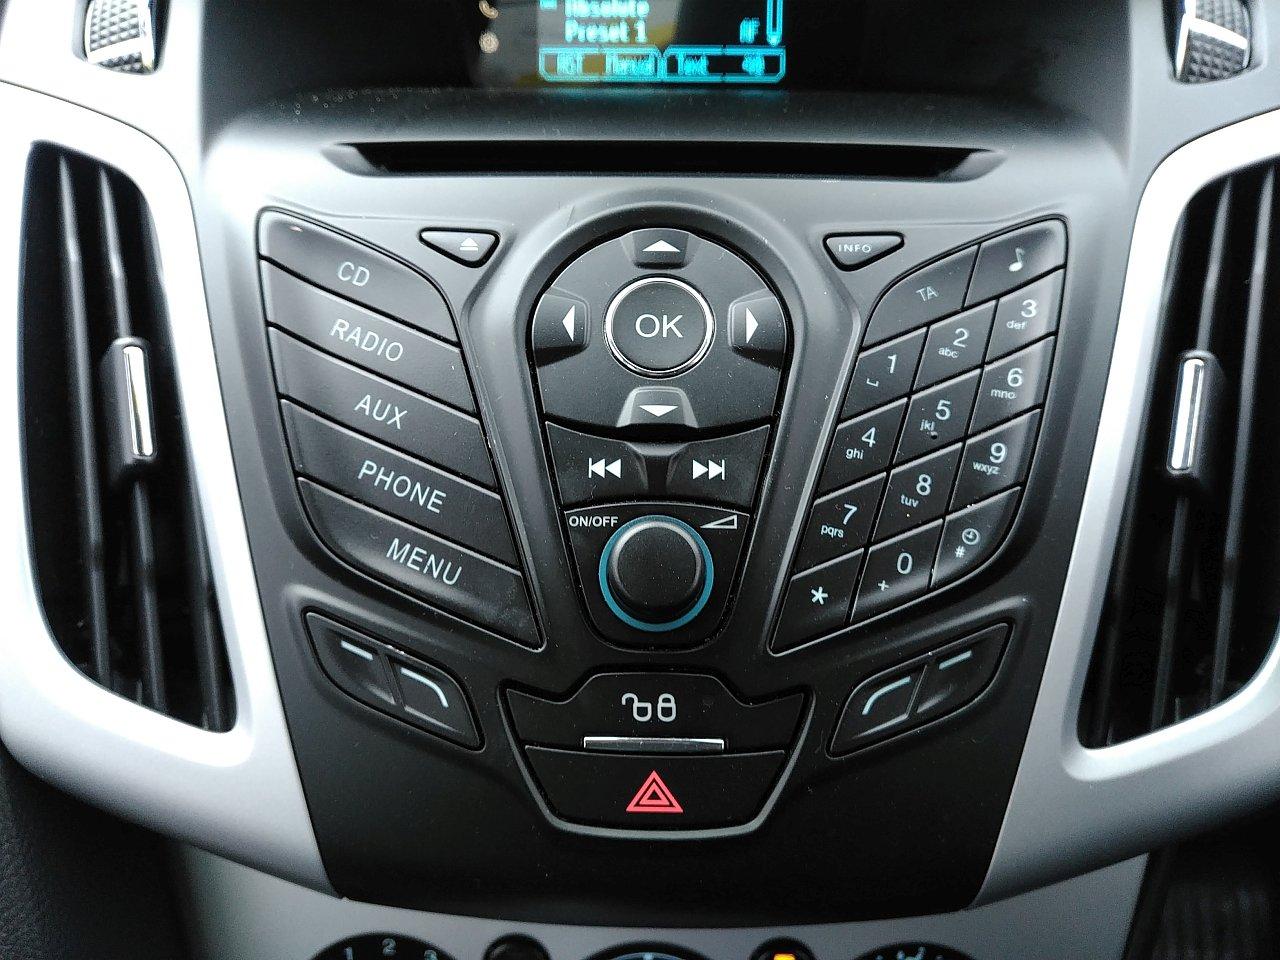 Ford Focus 2.0 TDCi 163 Zetec S 5dr Powershift image 16